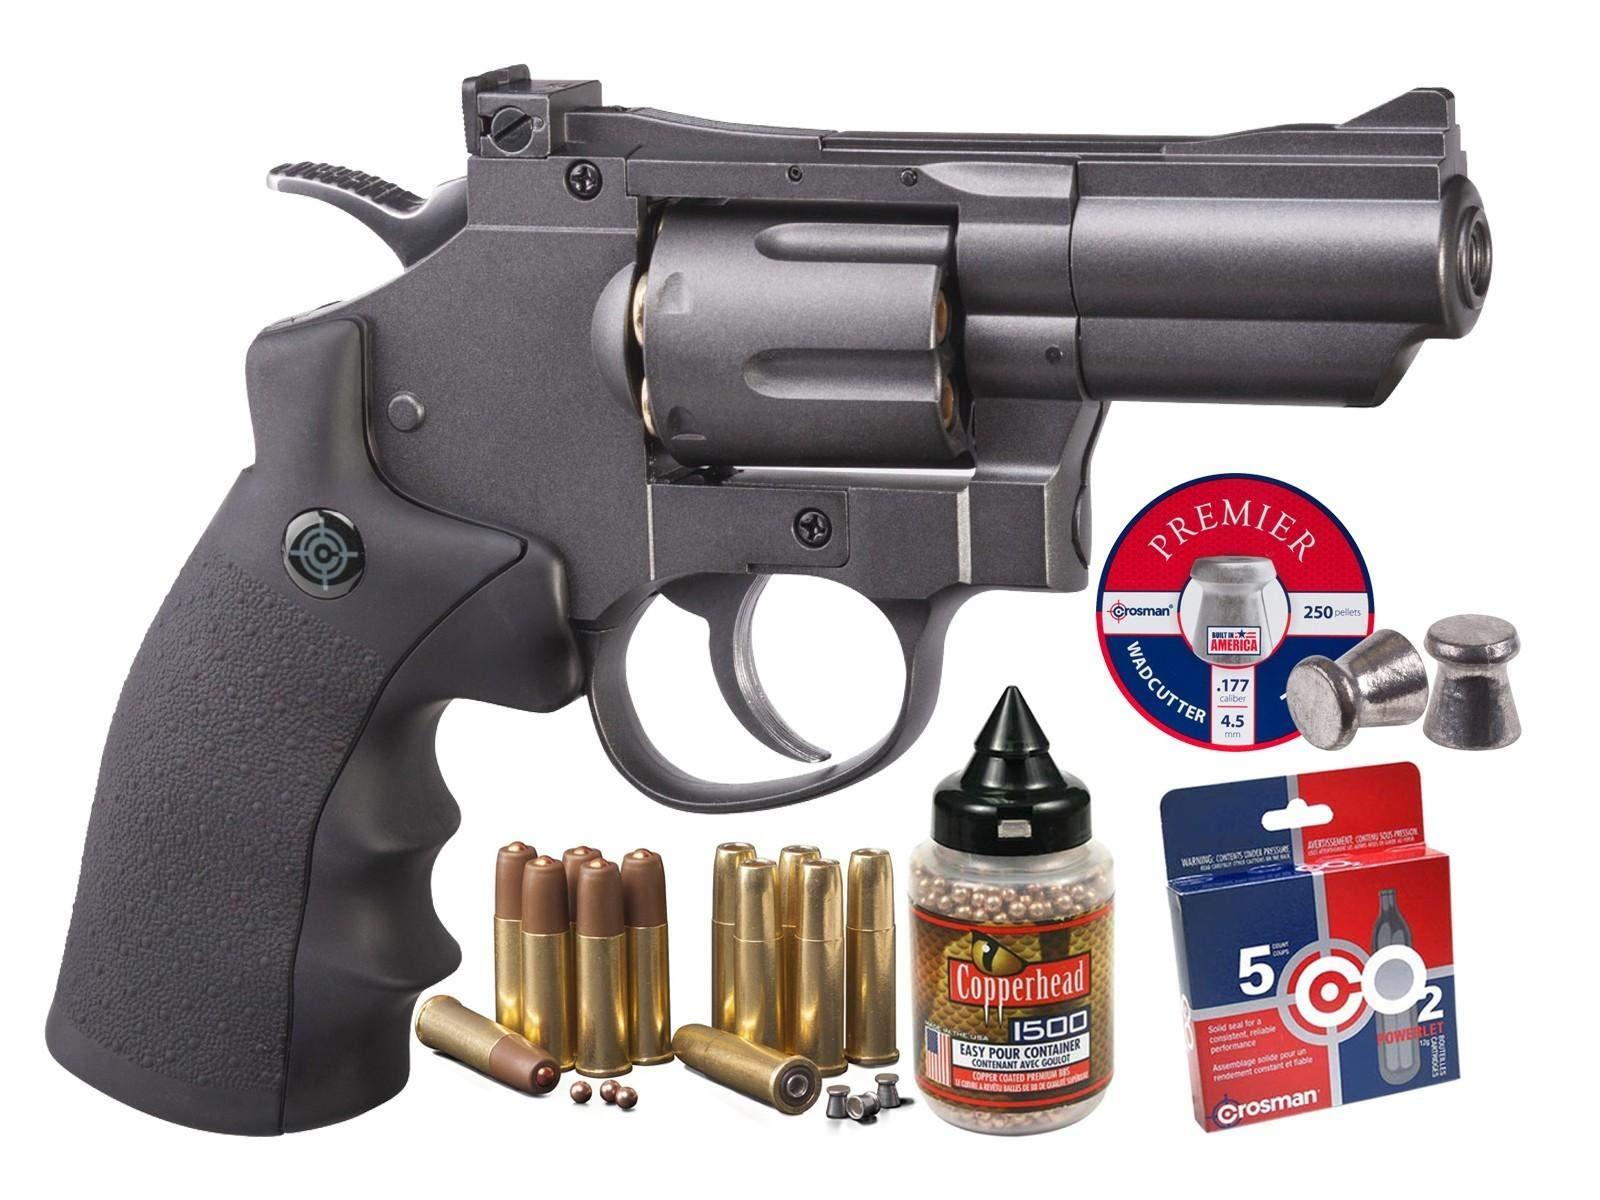 Crosman SNR357 Dual Metal Revolver